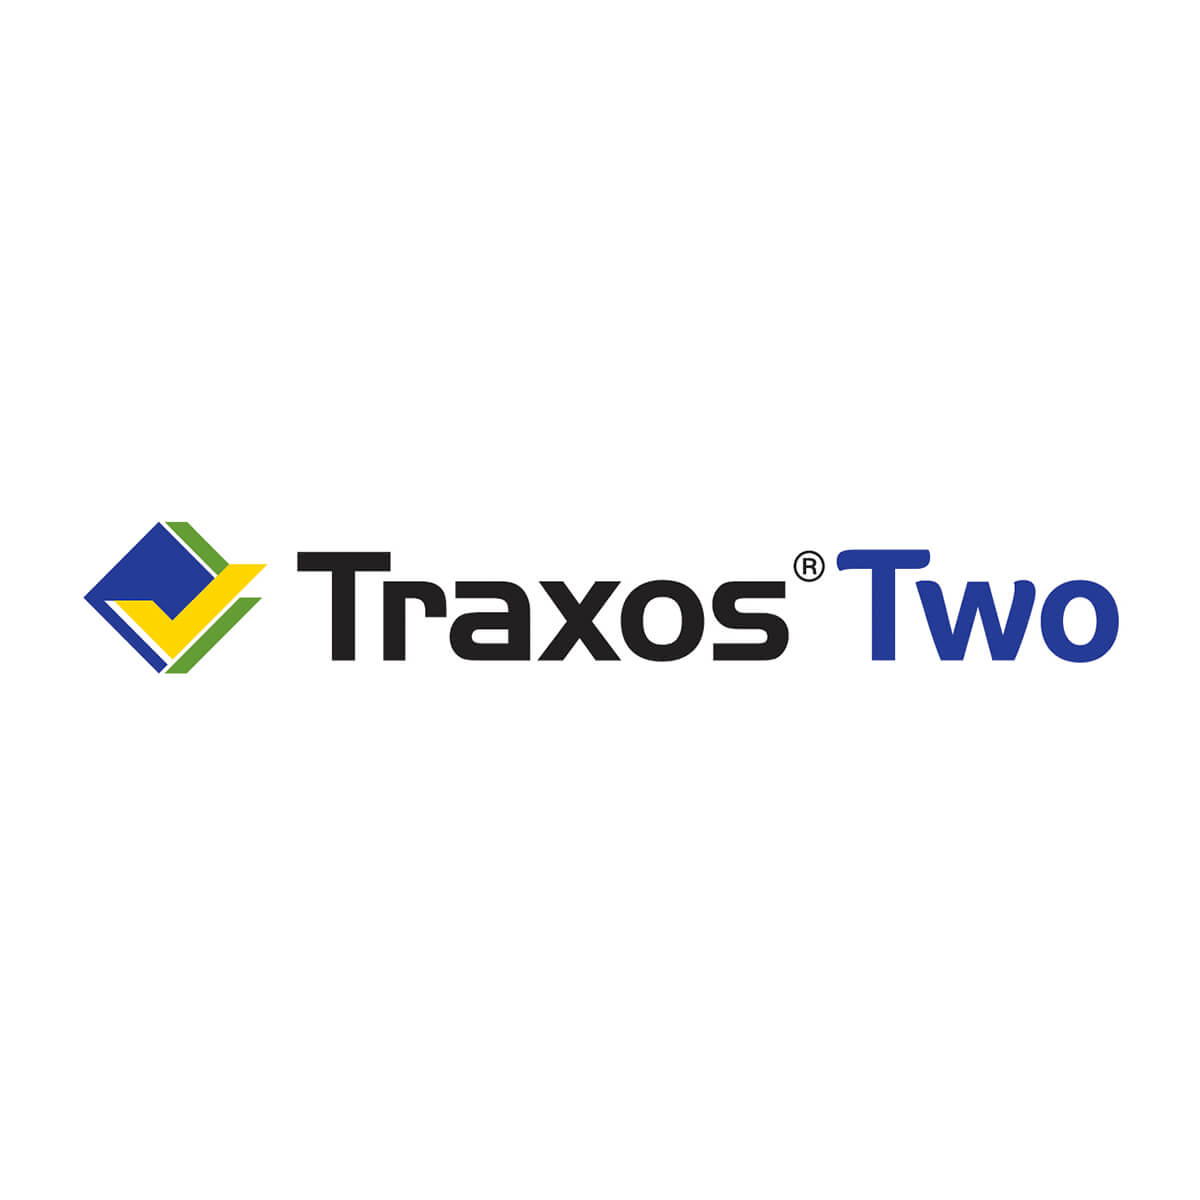 TRAXOS TWO CS